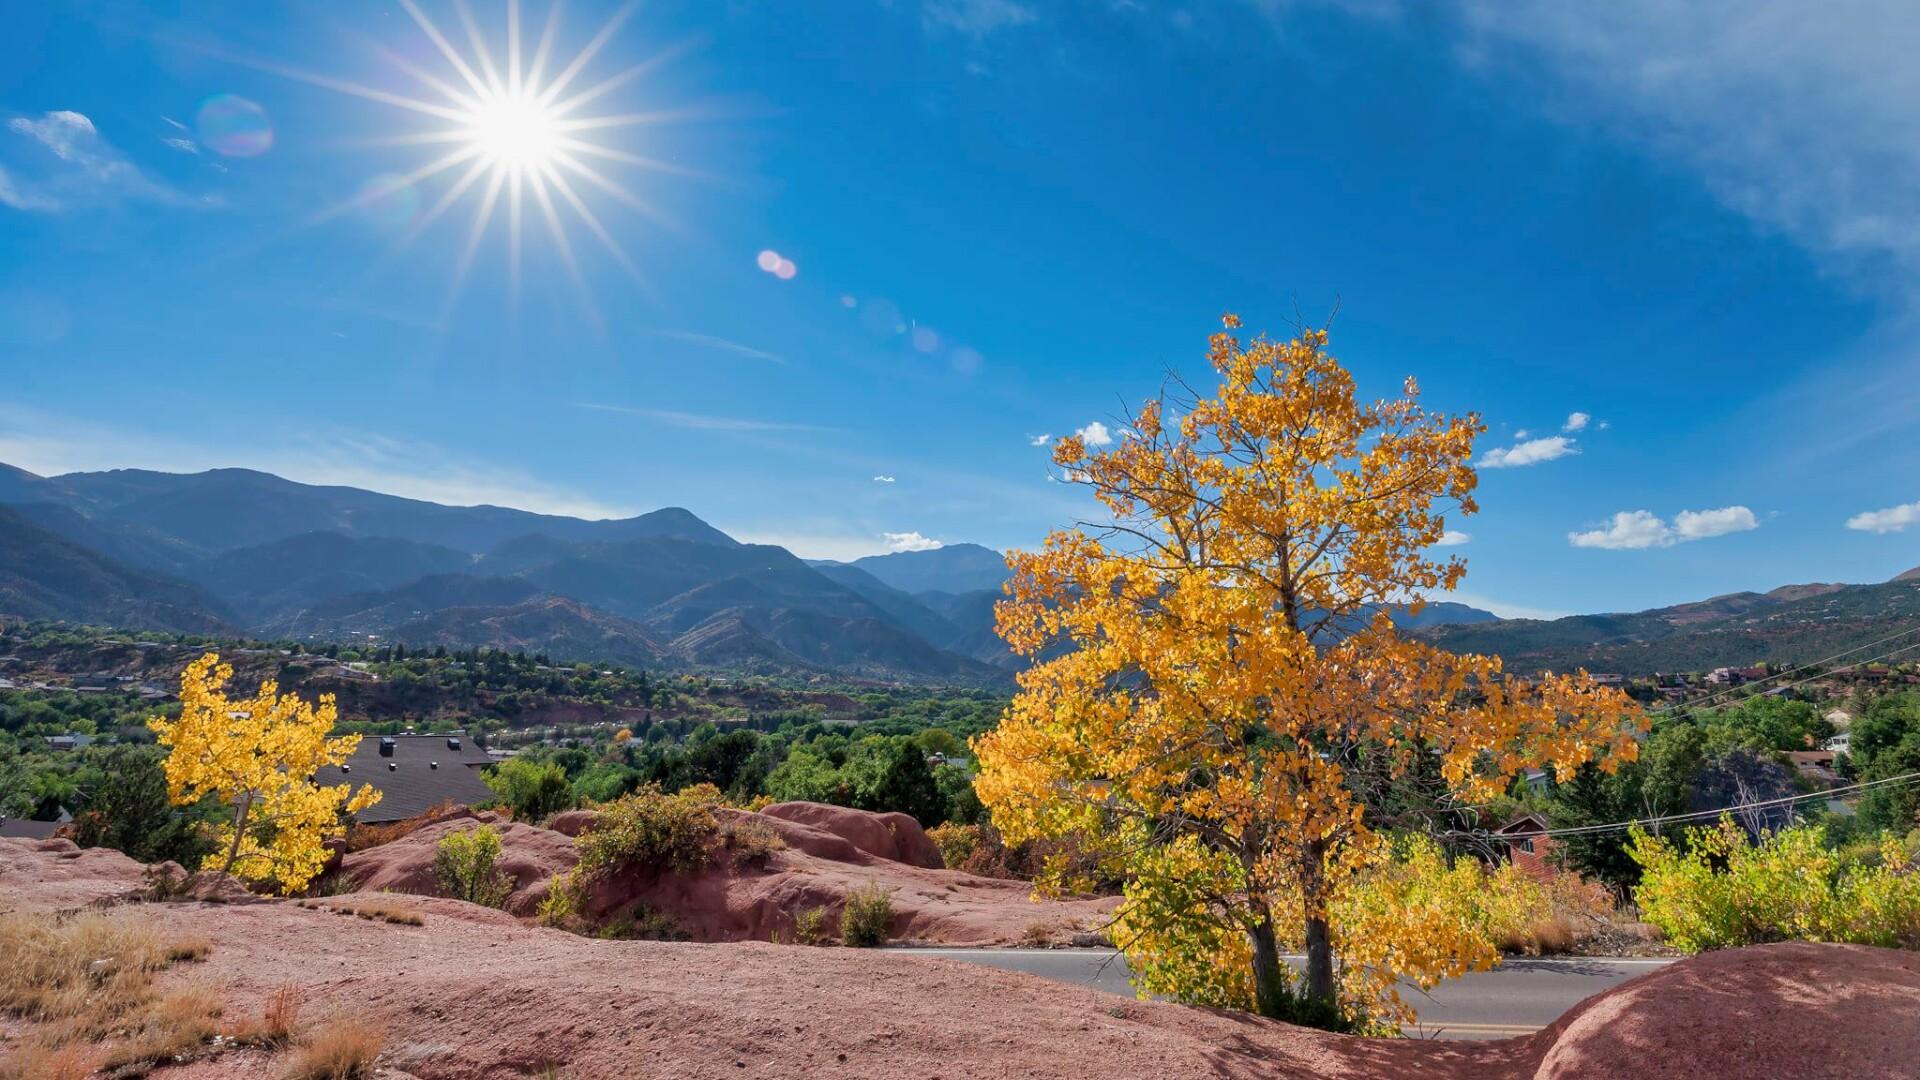 2Colorado Springs Larry Marr.jpg